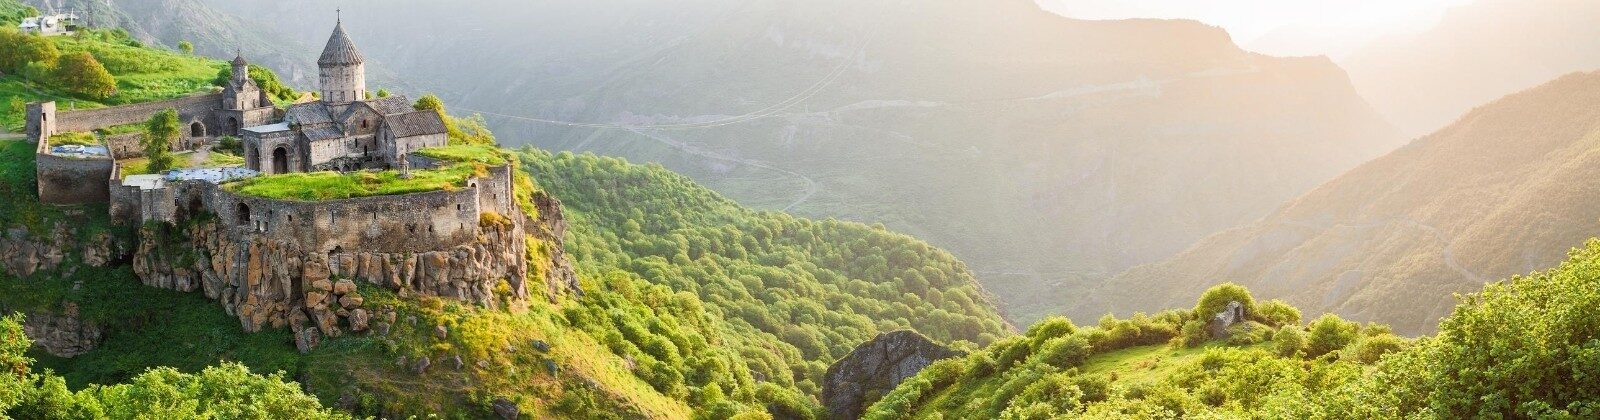 countryside armenia europe